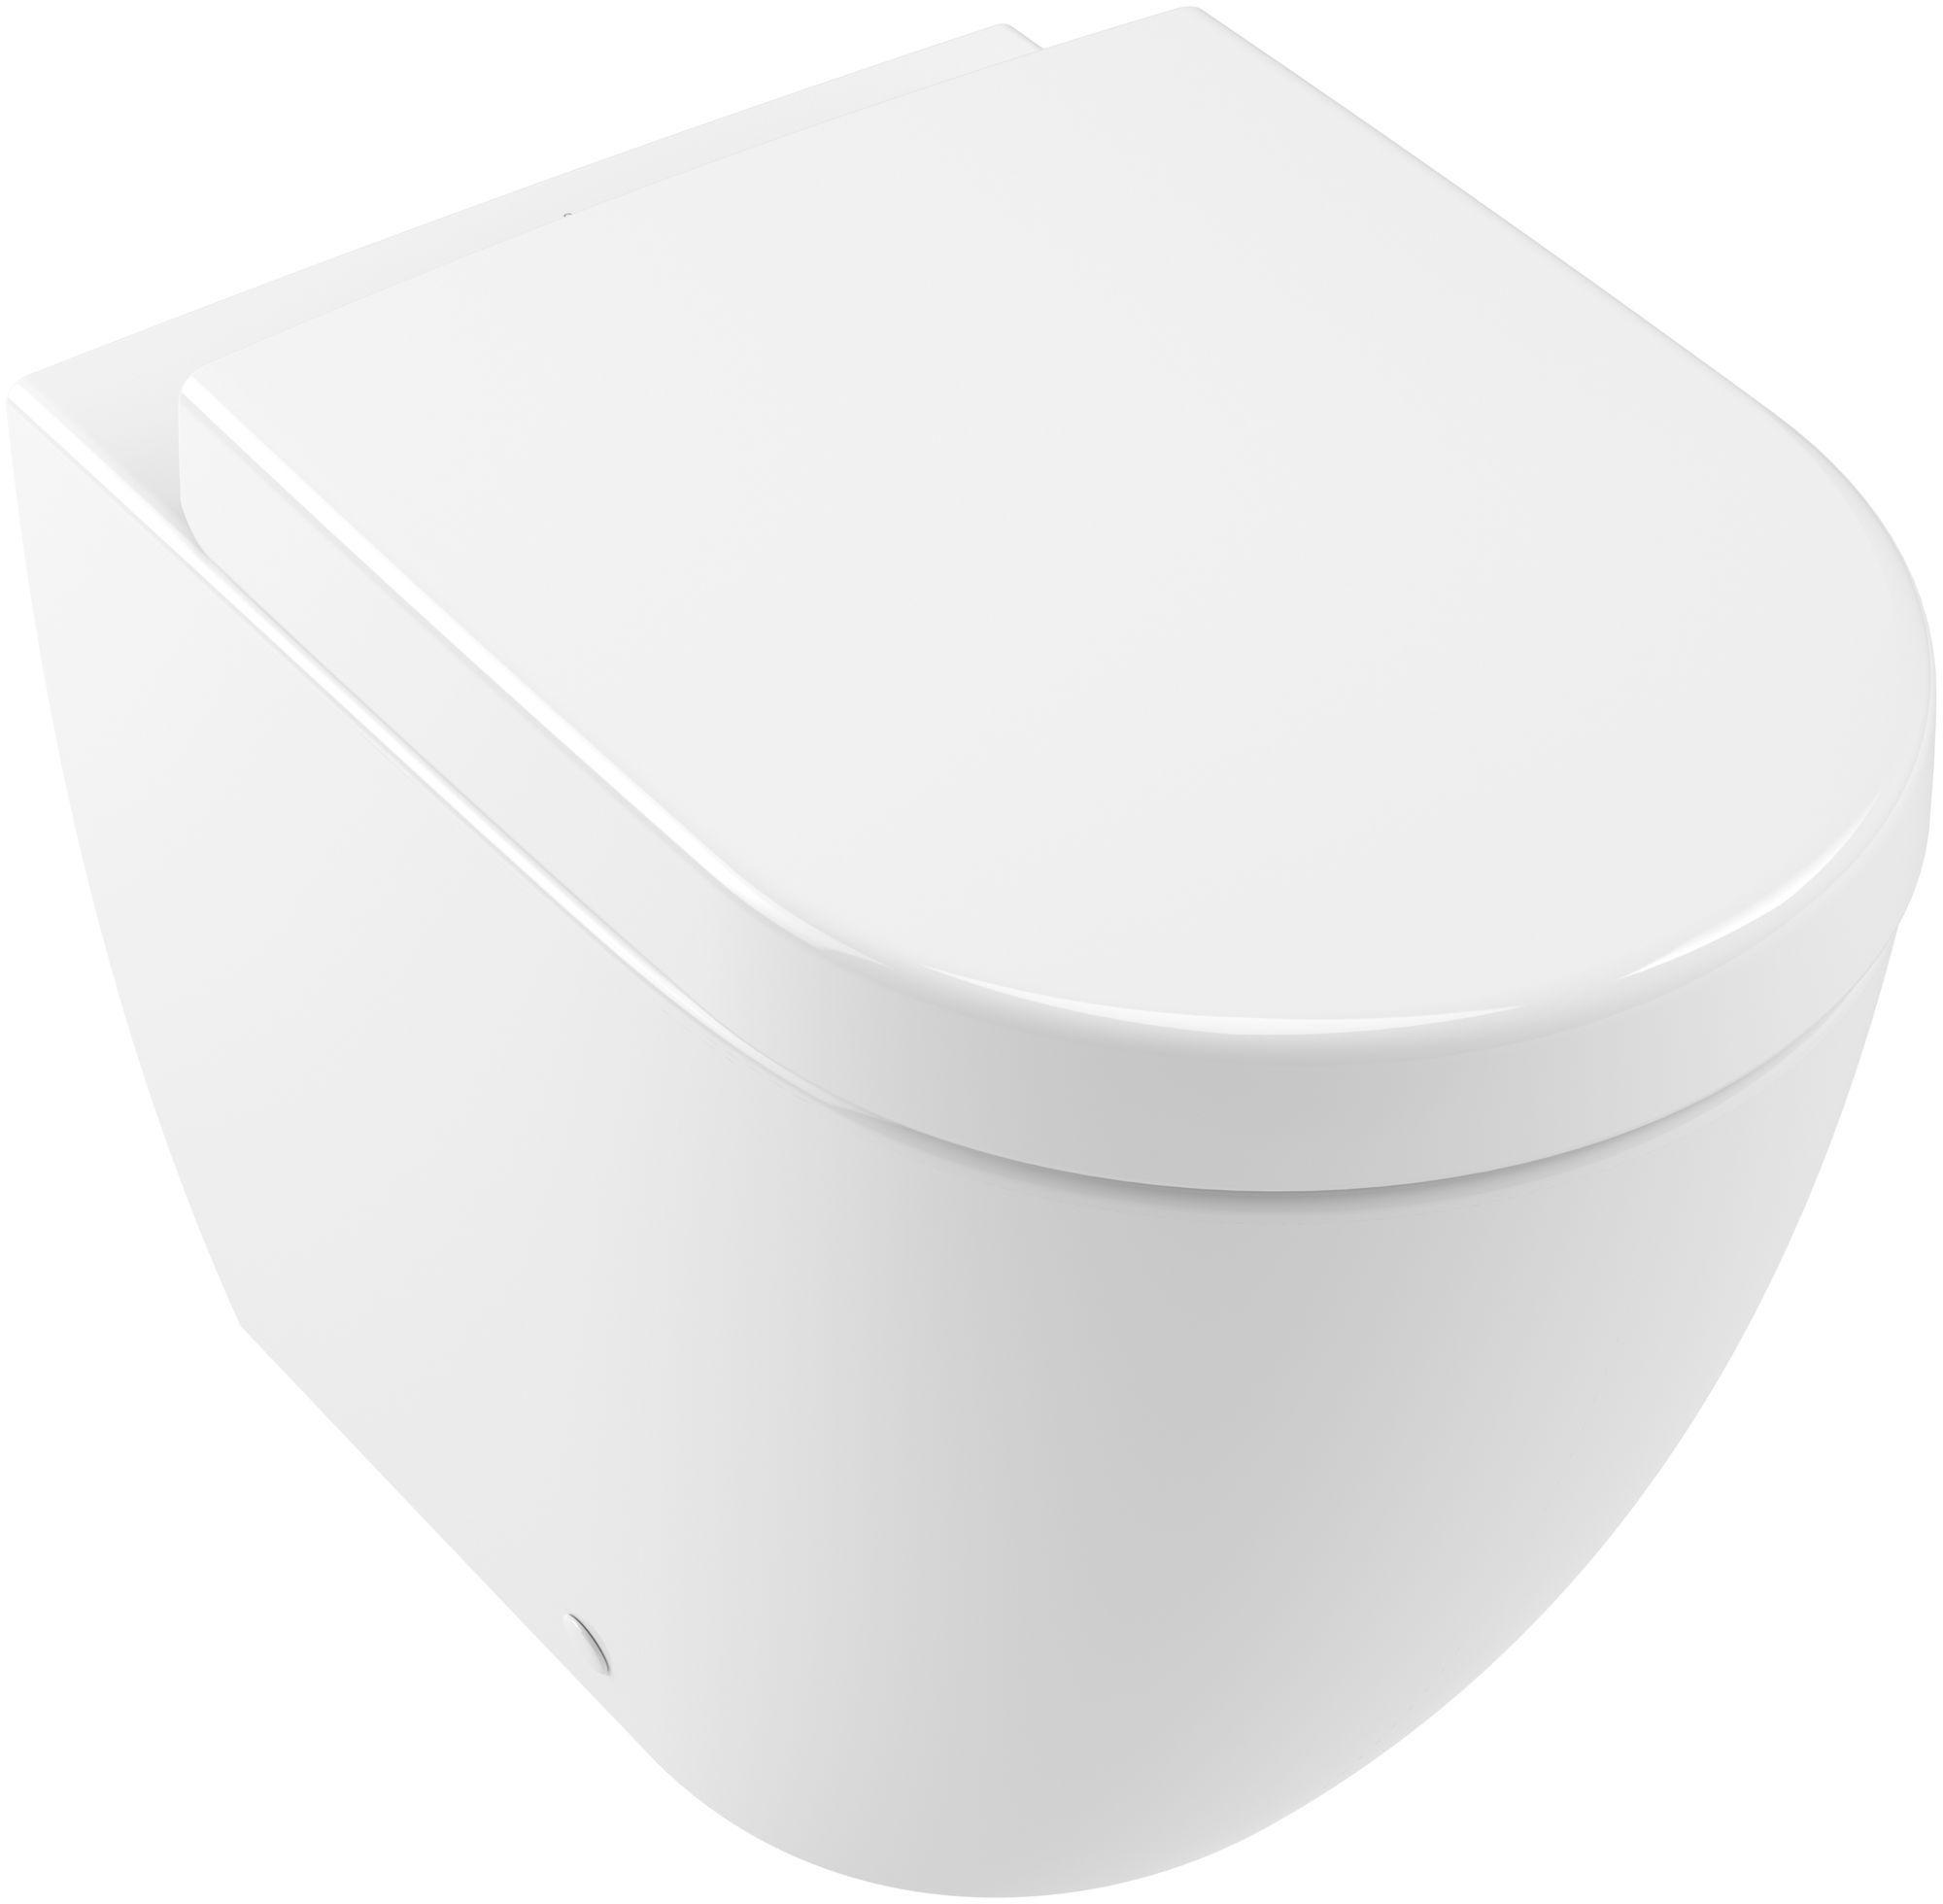 Villeroy & Boch Subway 2.0 Tiefspül-Stand-WC spülrandlos DirectFlush B:37xL:56cm weiß Ceramicplus 5602R0R1